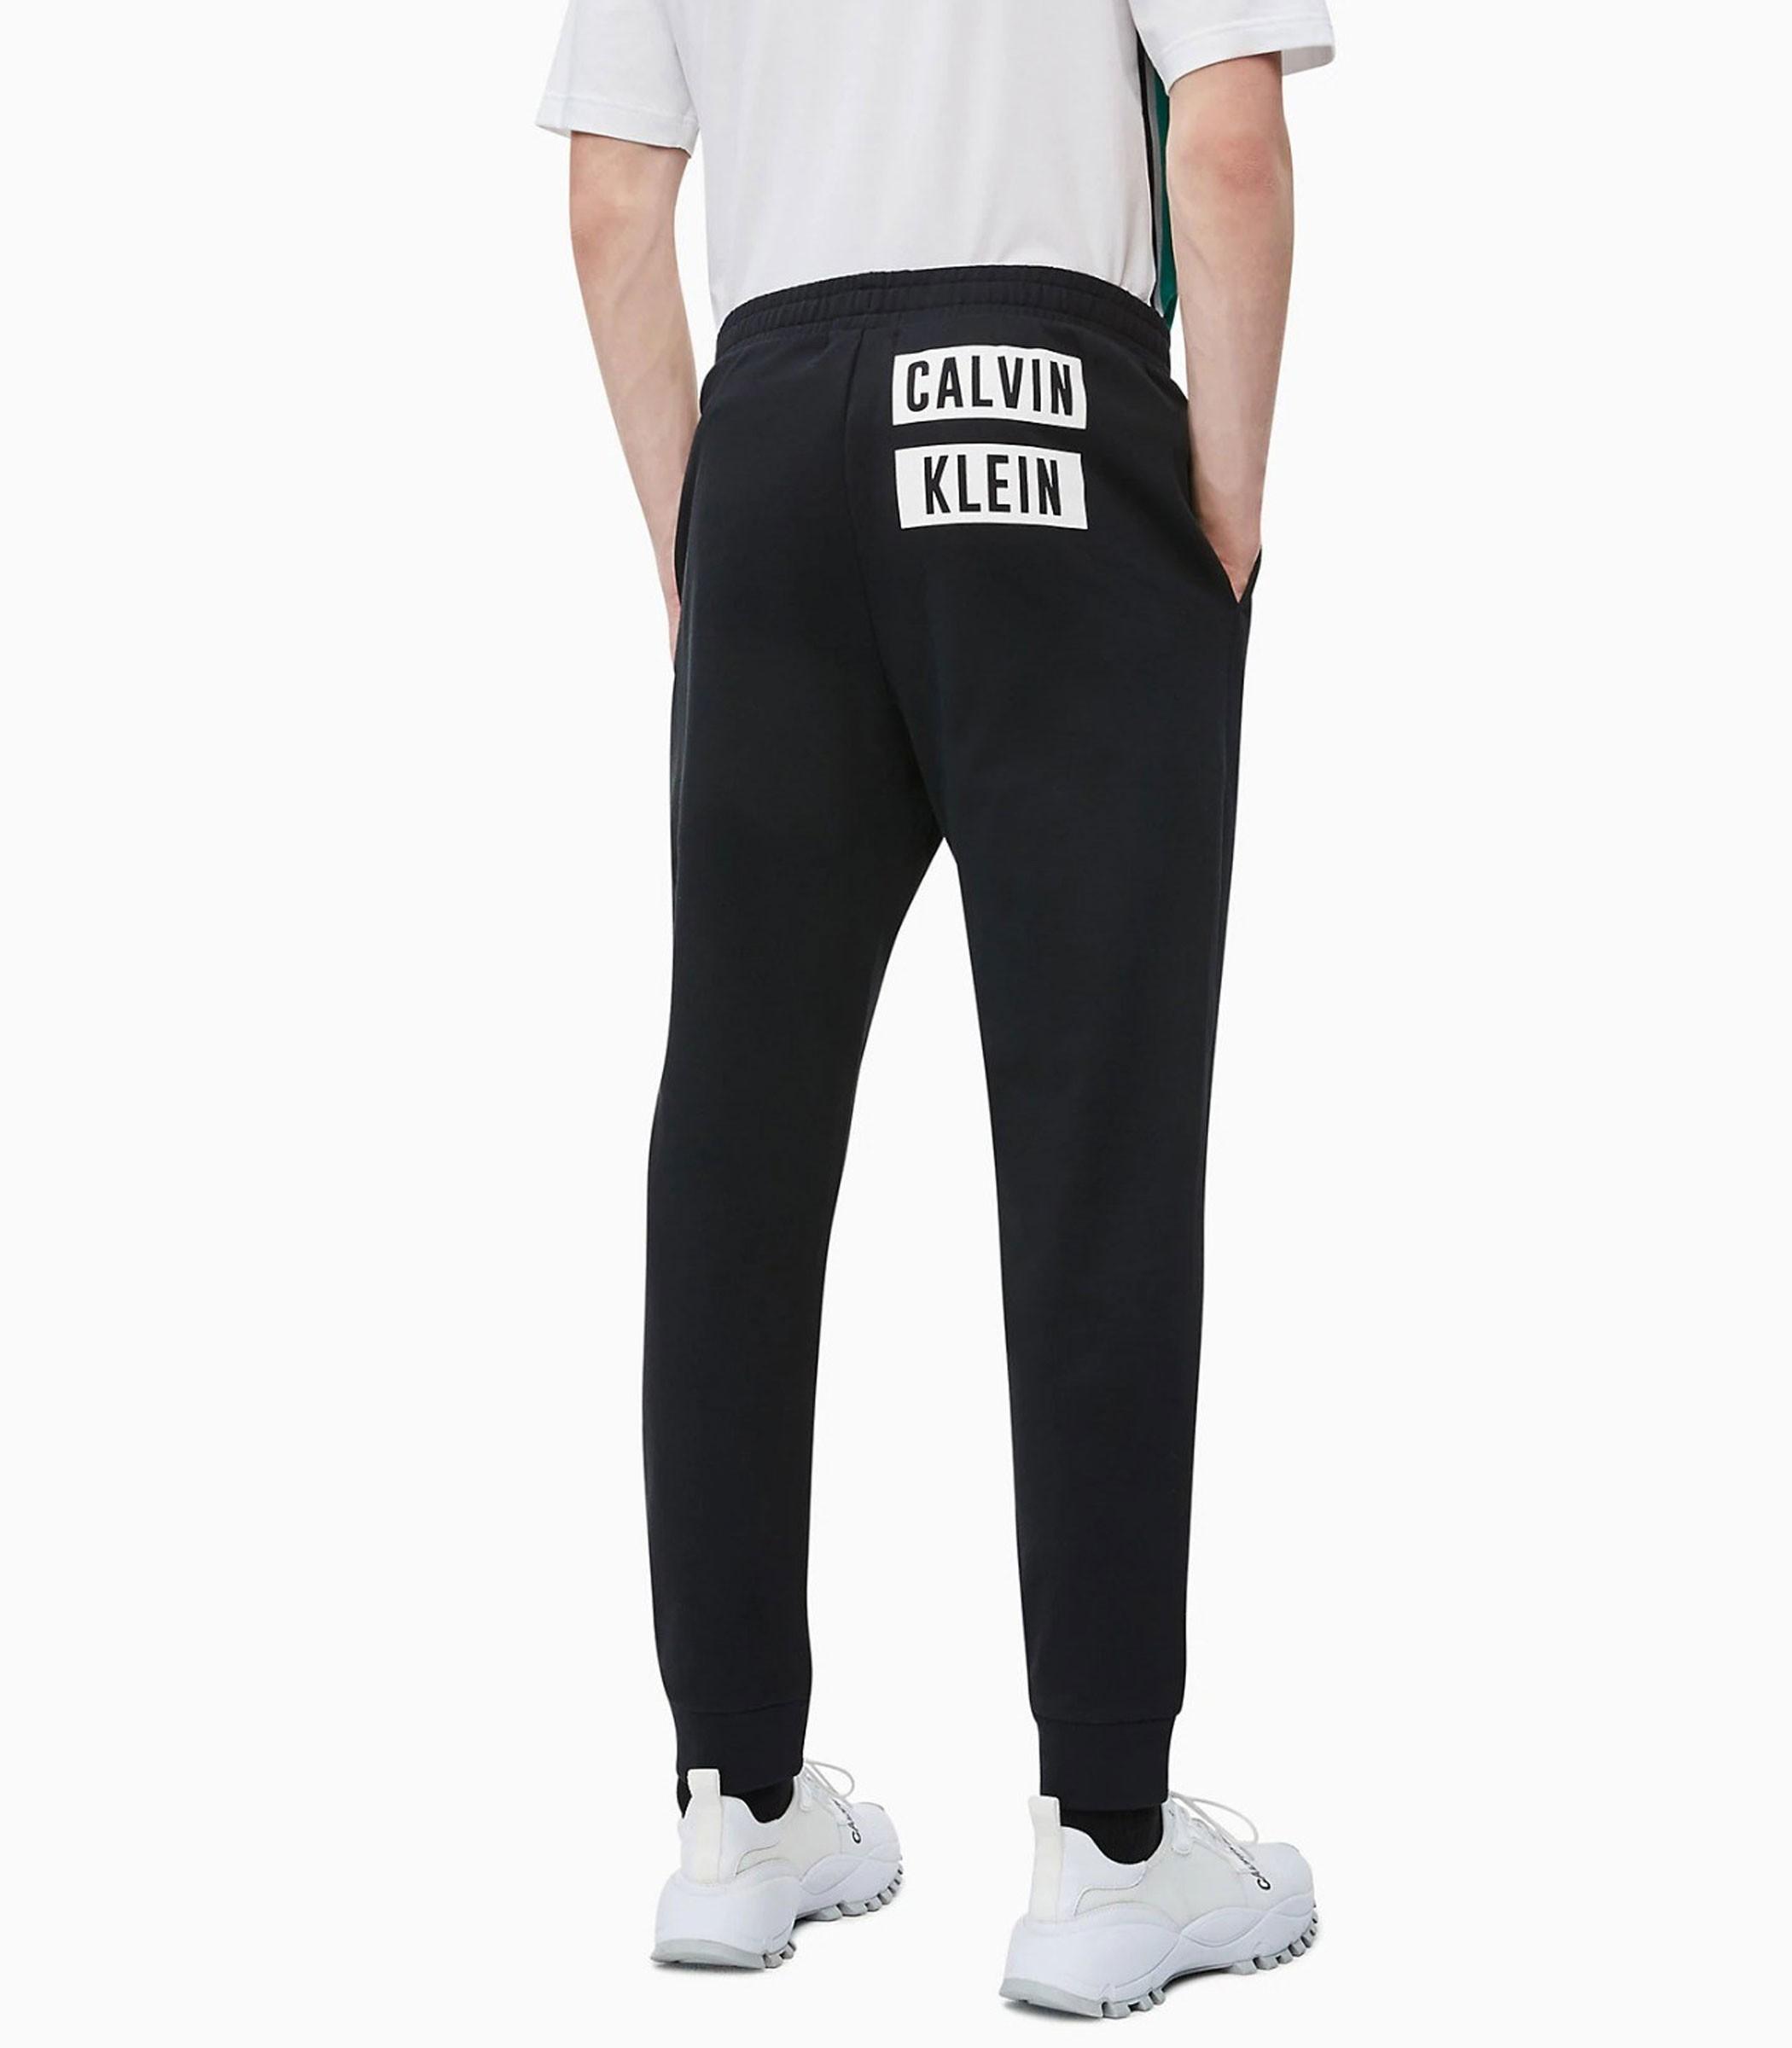 Pantaloni Calvin Klein Performance in tuta da uomo rif